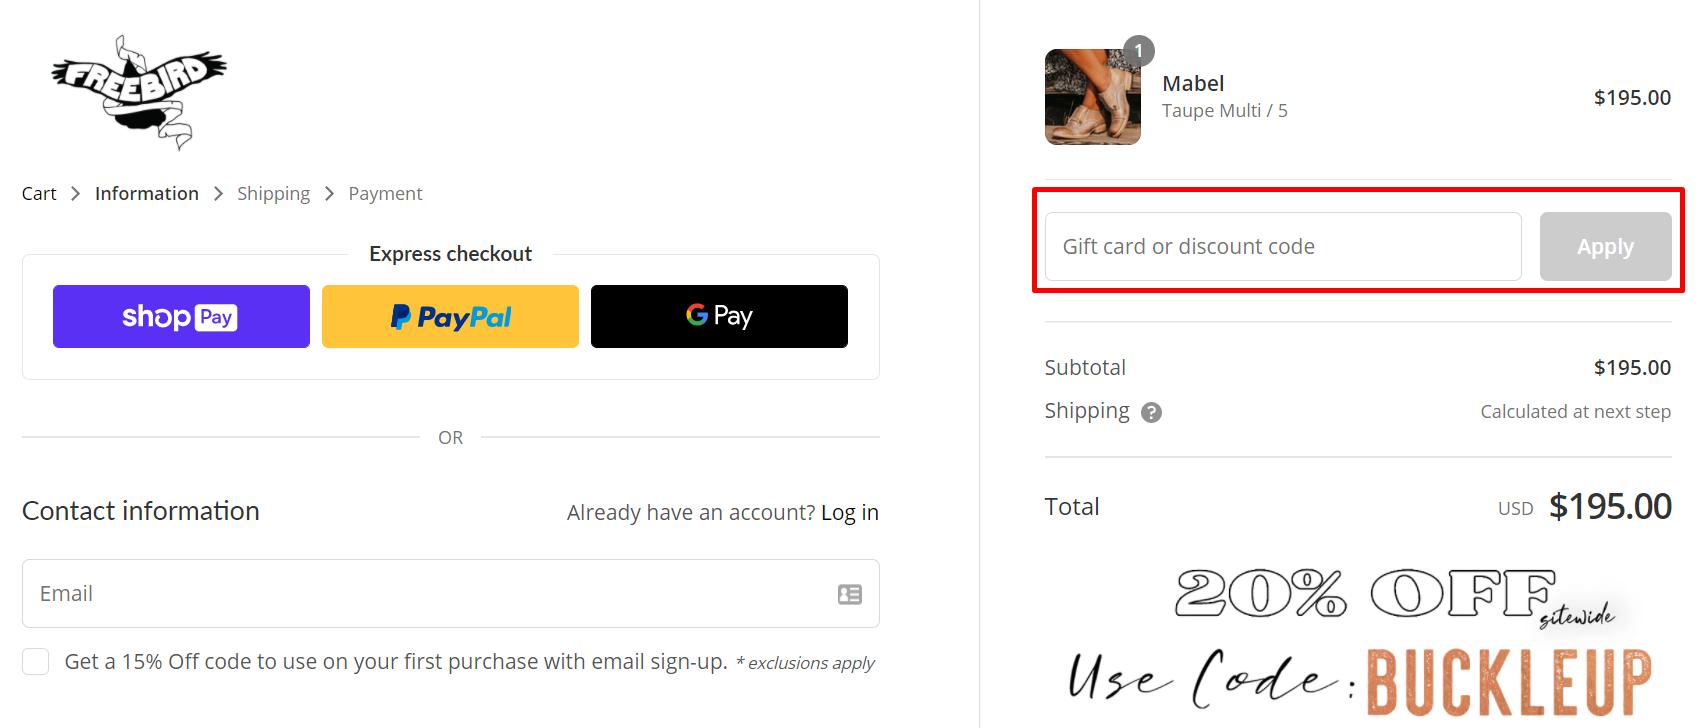 How do I use my FREEBIRD discount code?